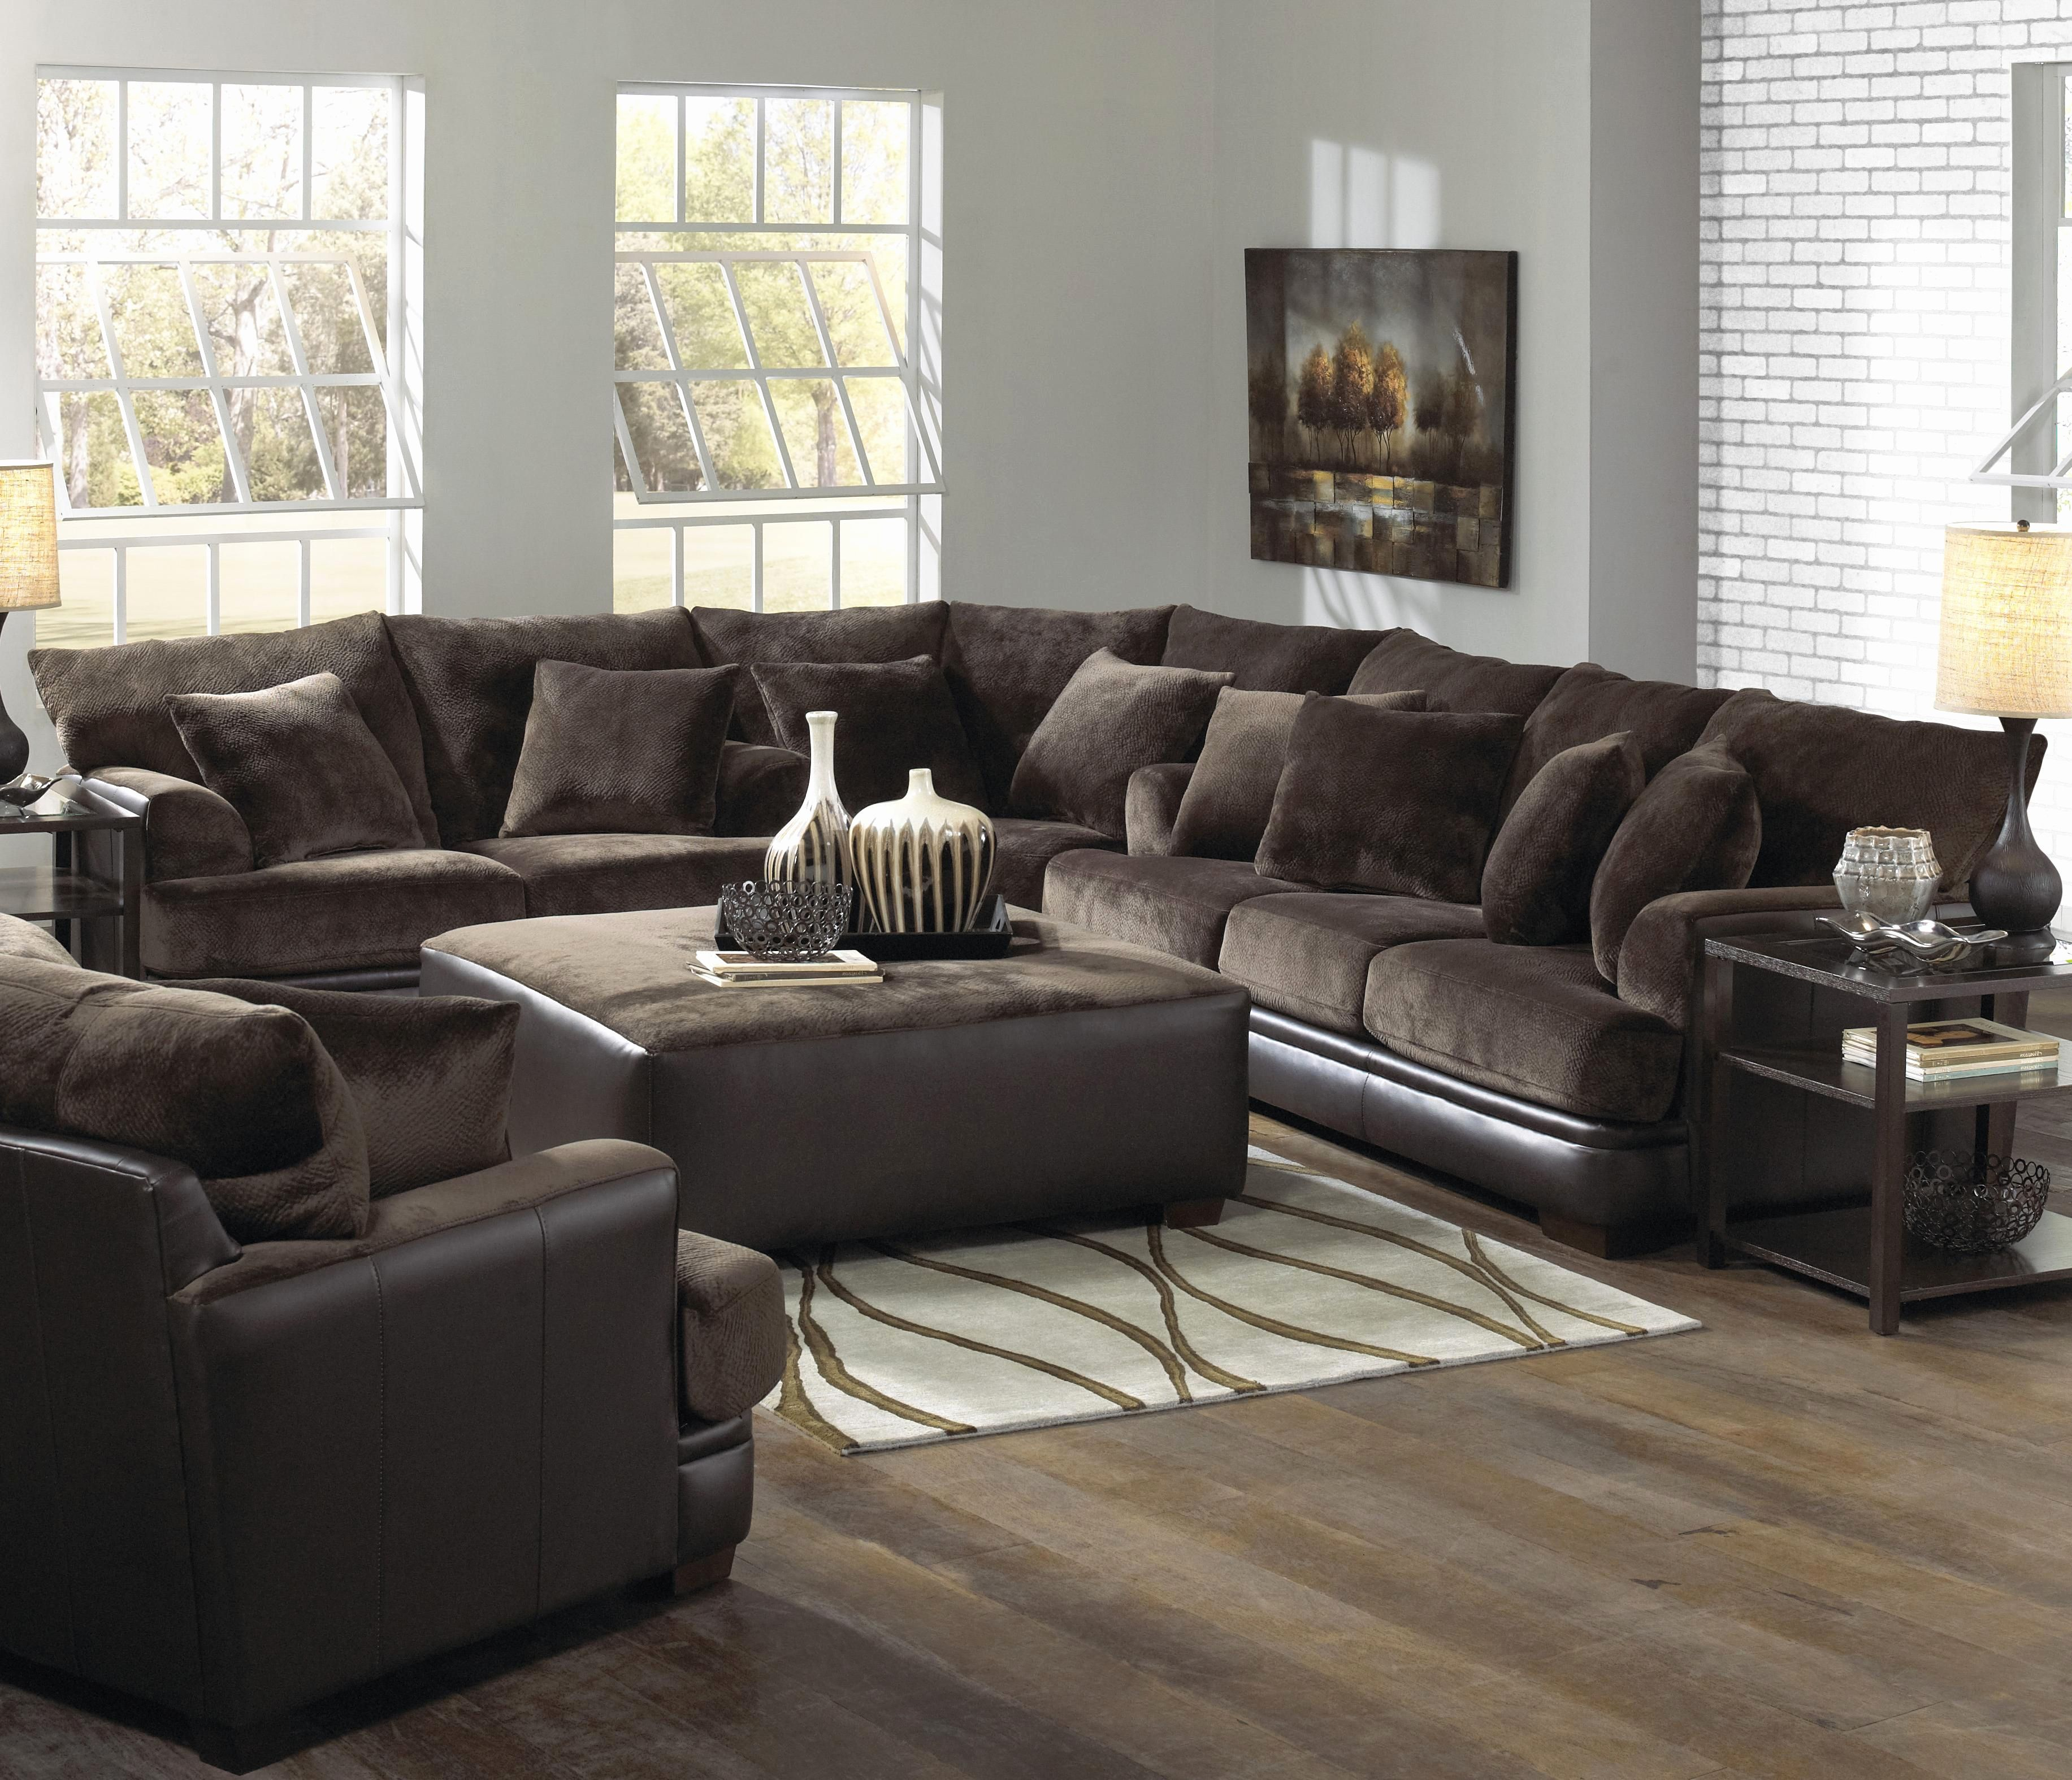 New Gray Velvet Sectional Sofa Shot L Shaped Gray Velvet Sectional Couch With Leat Sectional Living Room Sets Cheap Living Room Sets Living Room Sets Furniture